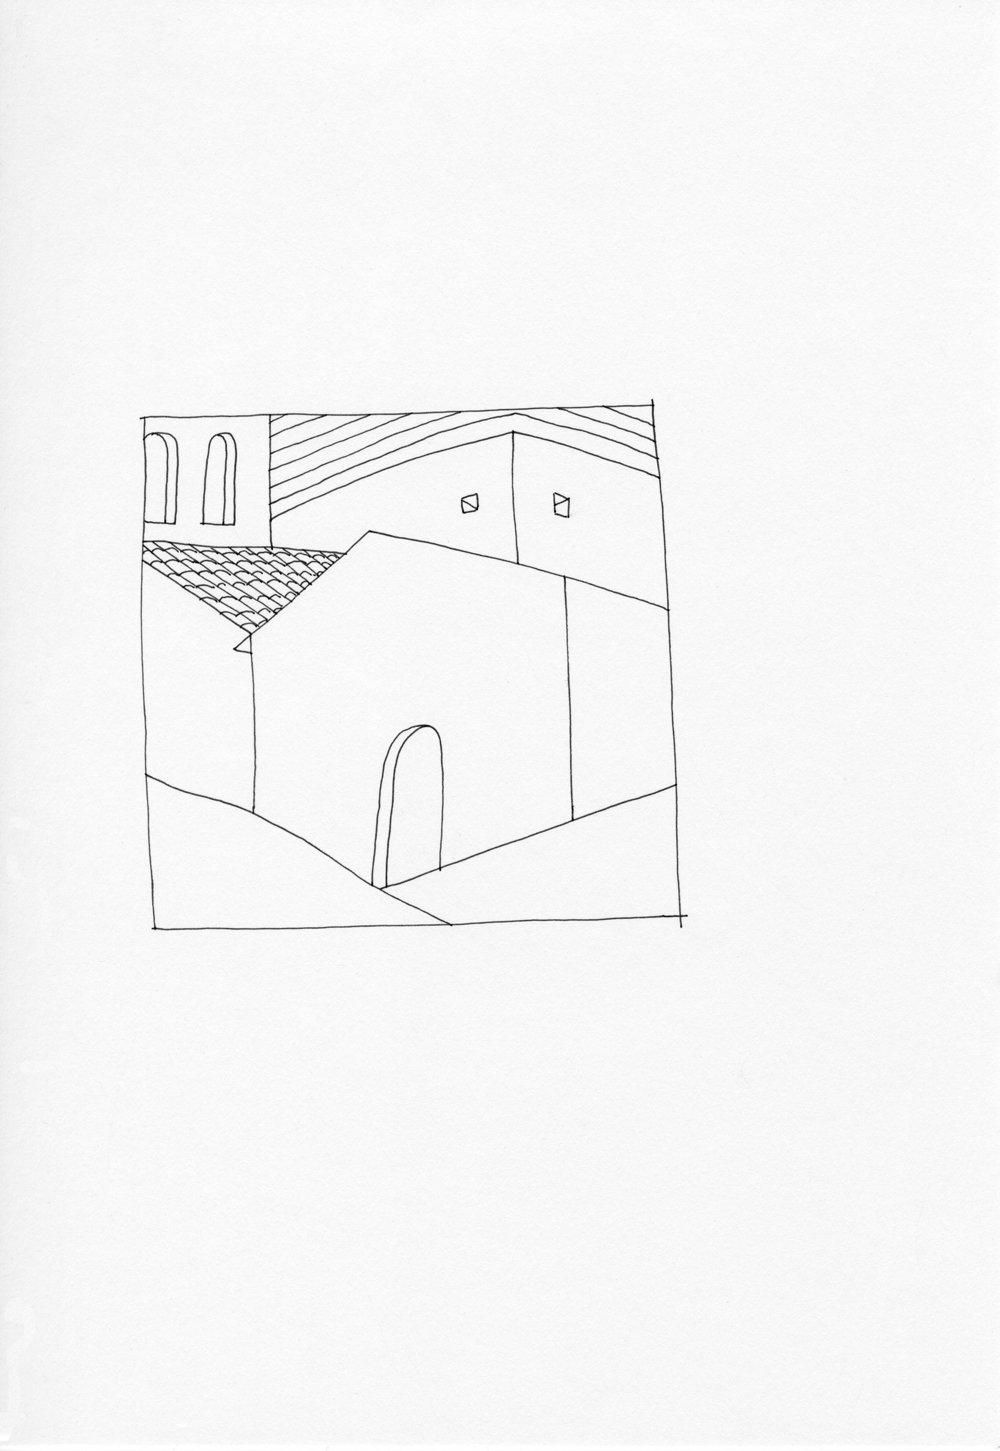 juliet furst SHP sketch 4.jpg